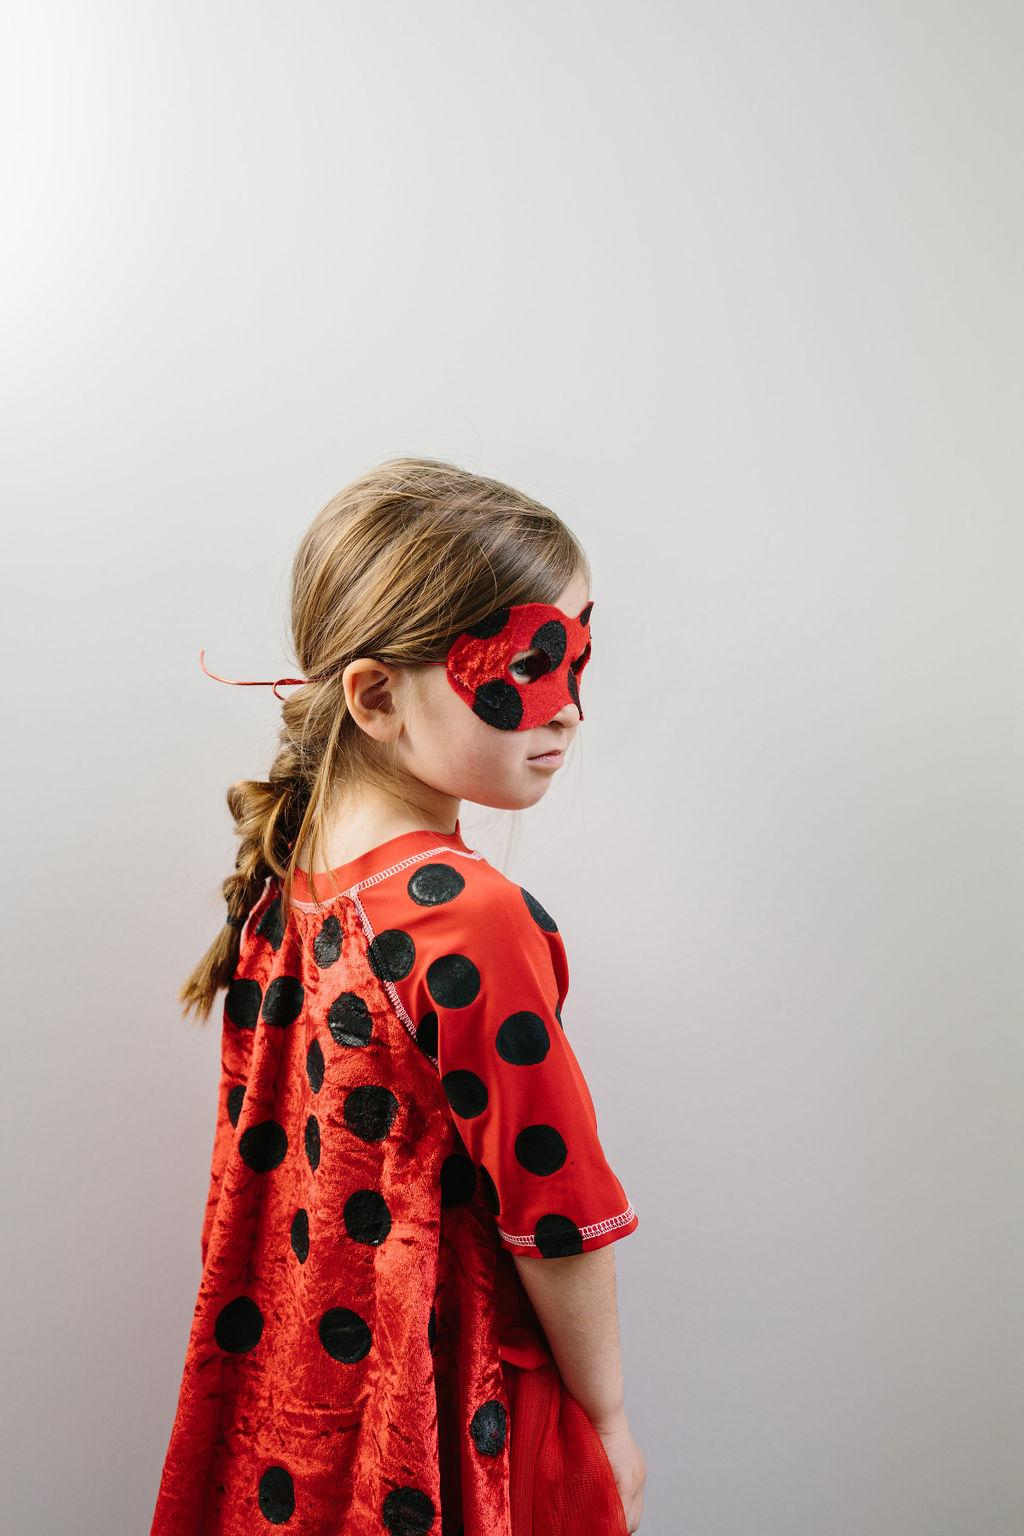 A little girl wearing a miraculous ladybug costume